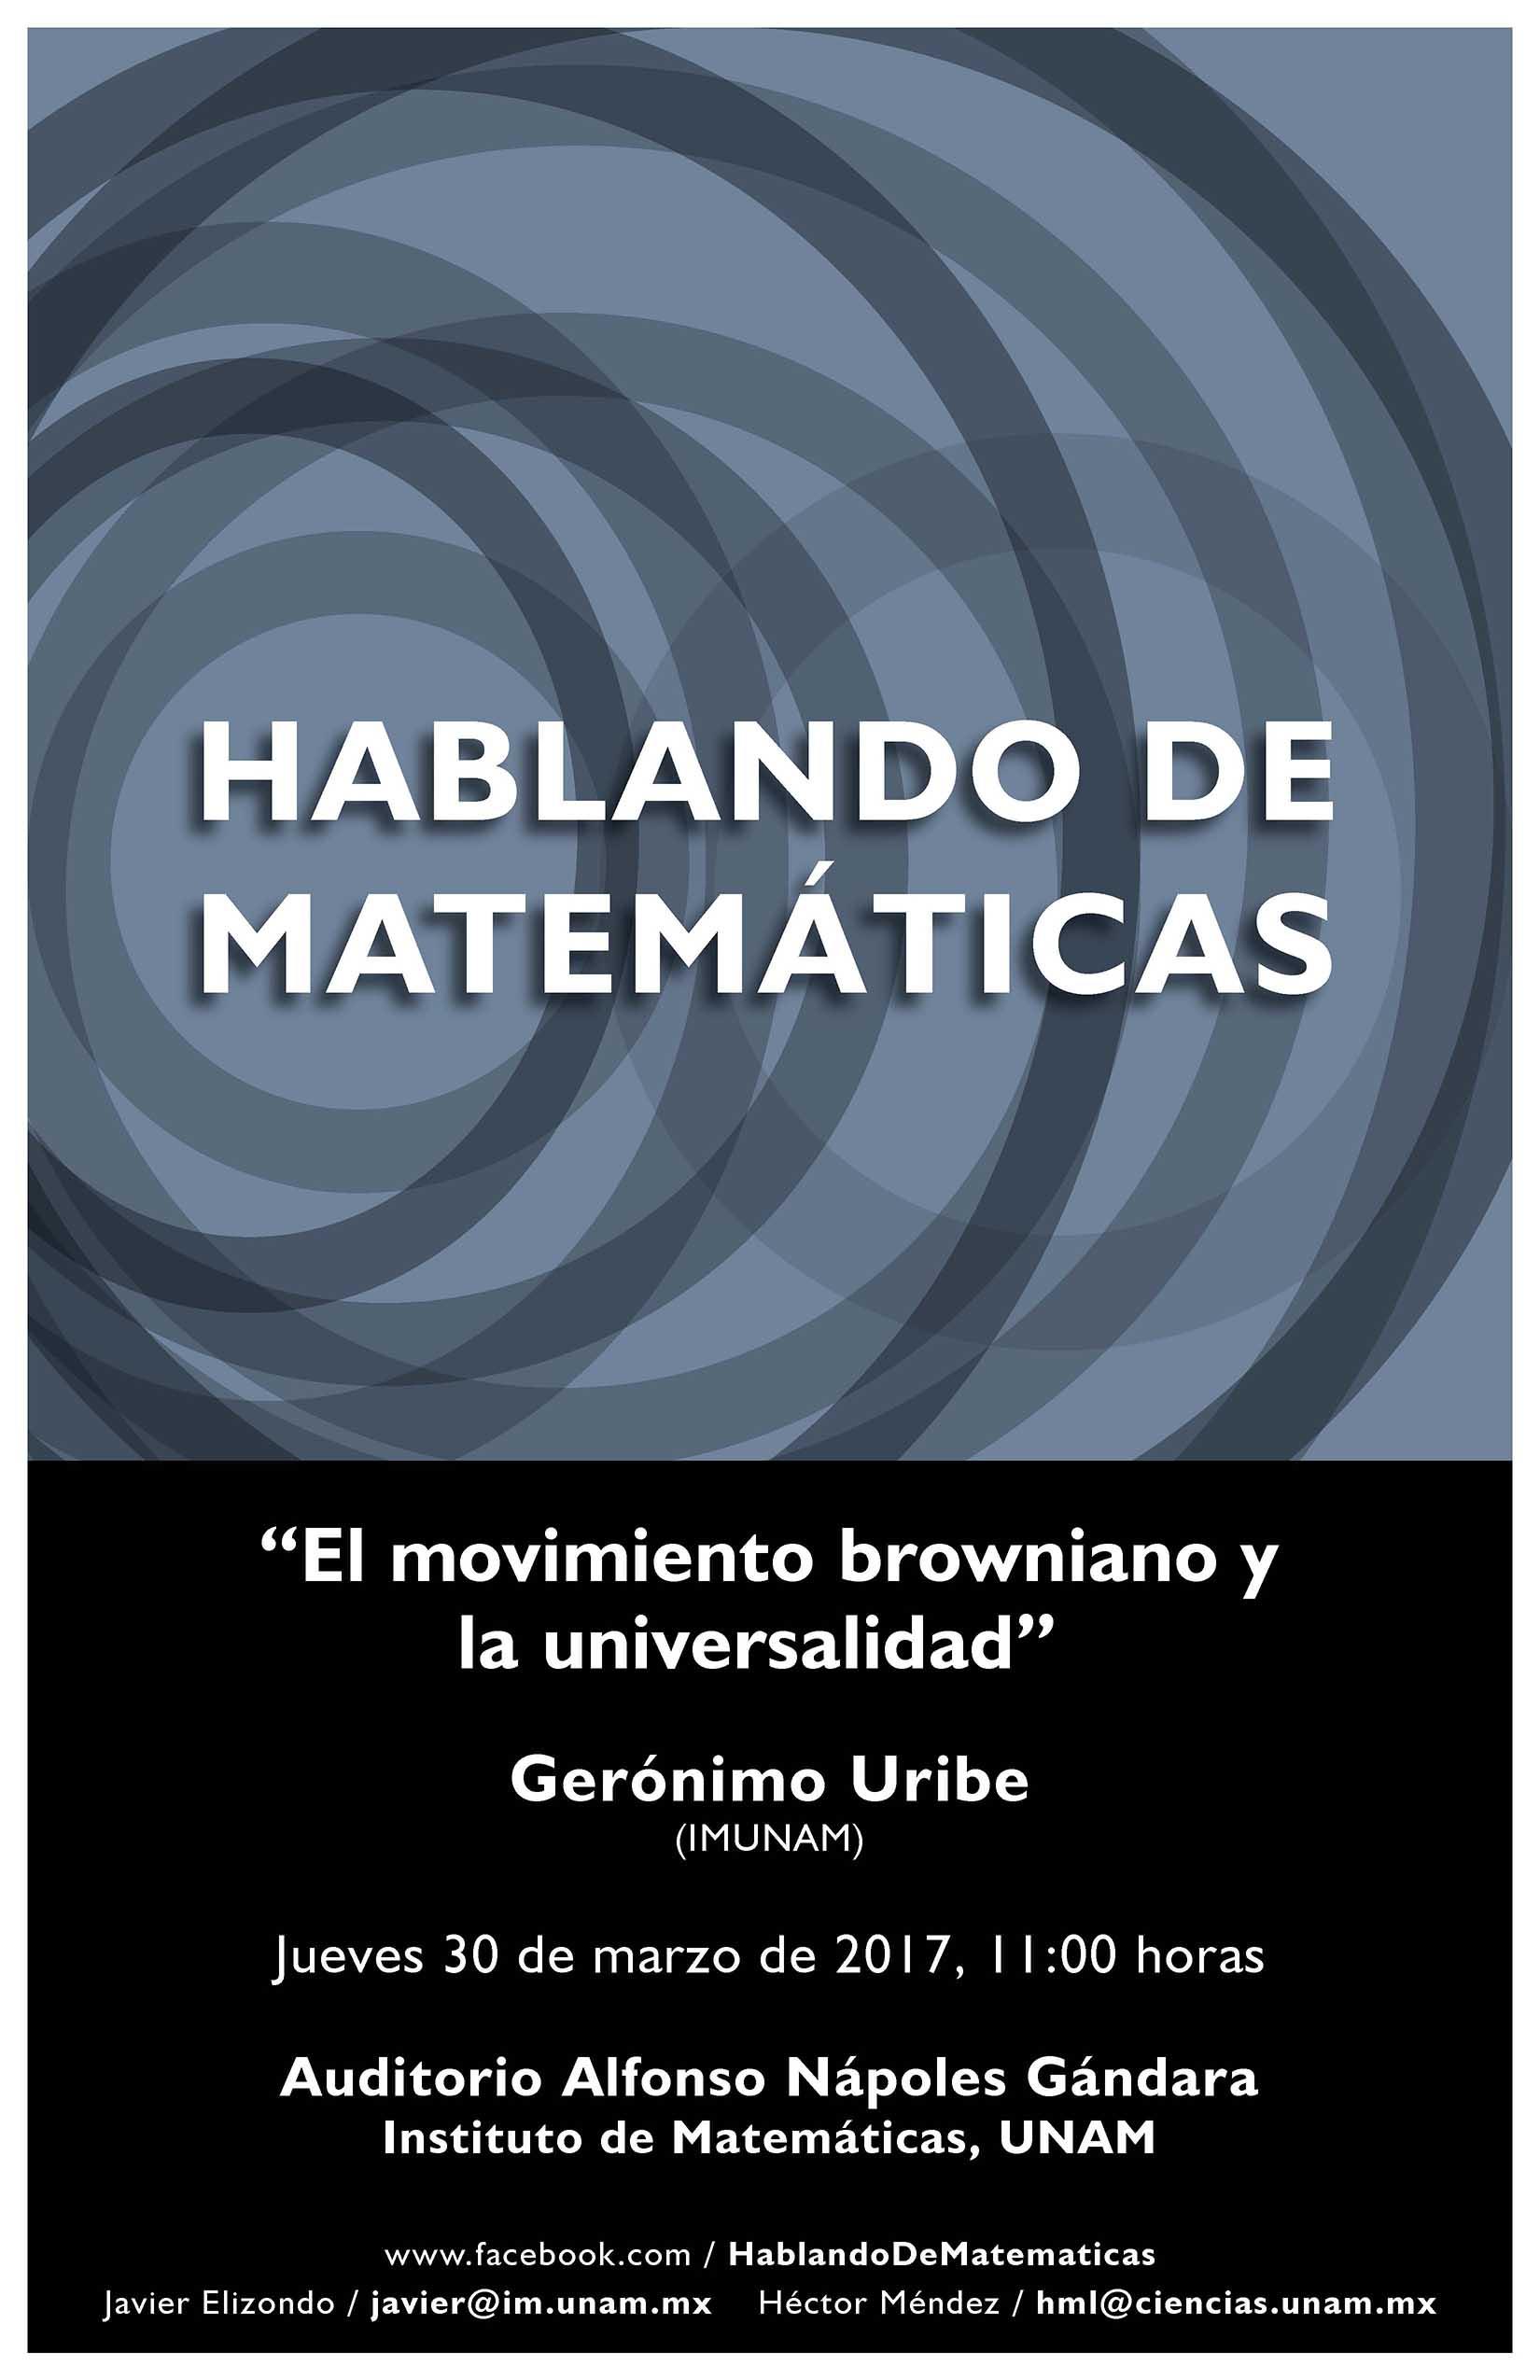 Hablando de Matemáticas: Gerónimo Uribe, IMUNAM